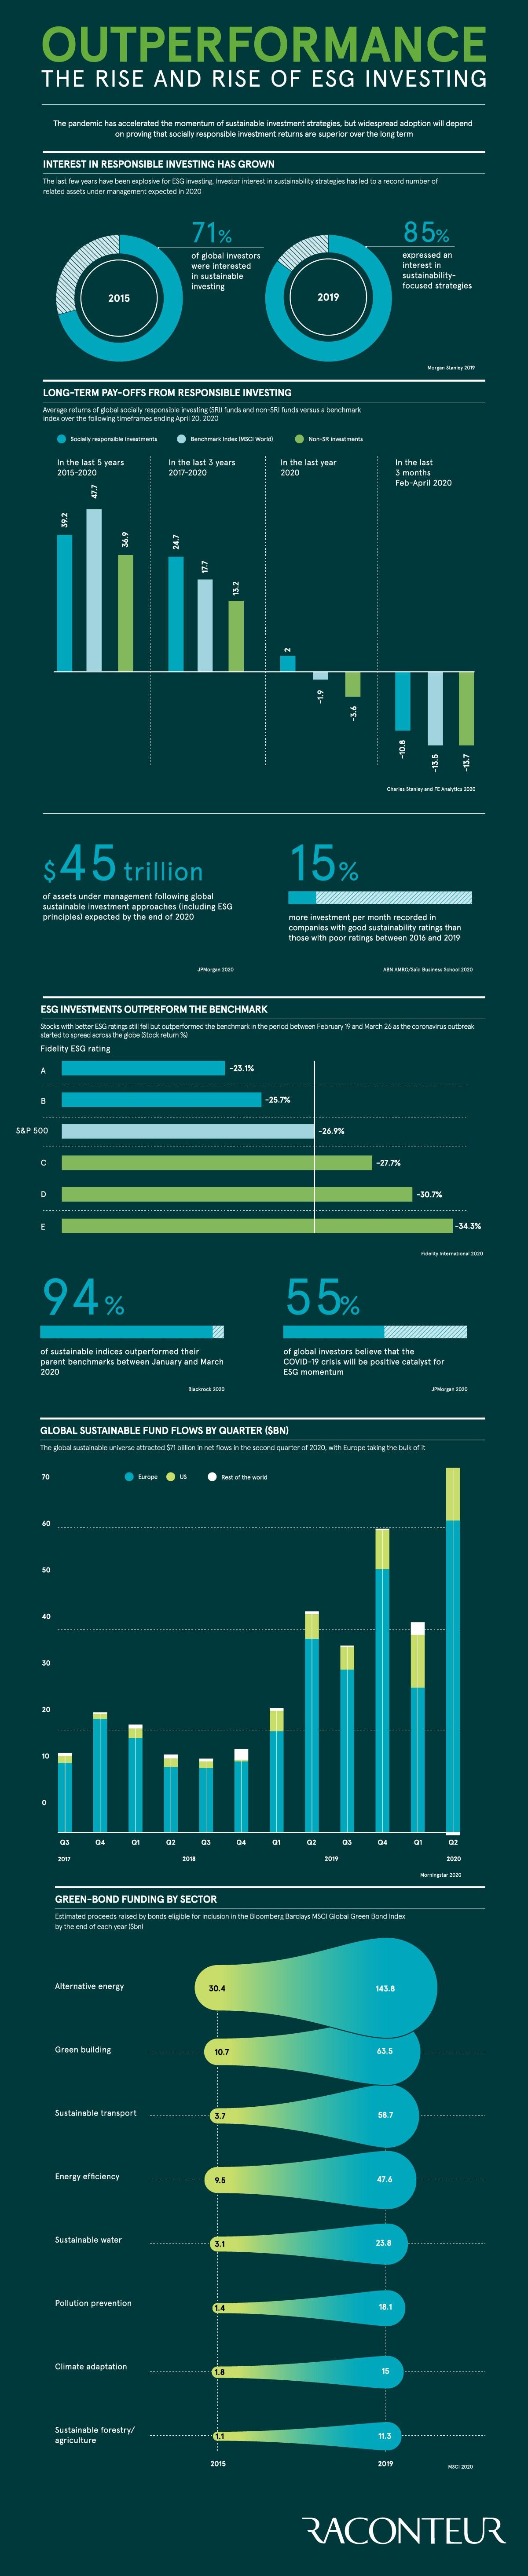 The ESG Megatrend Meets Green Bonds #infographic